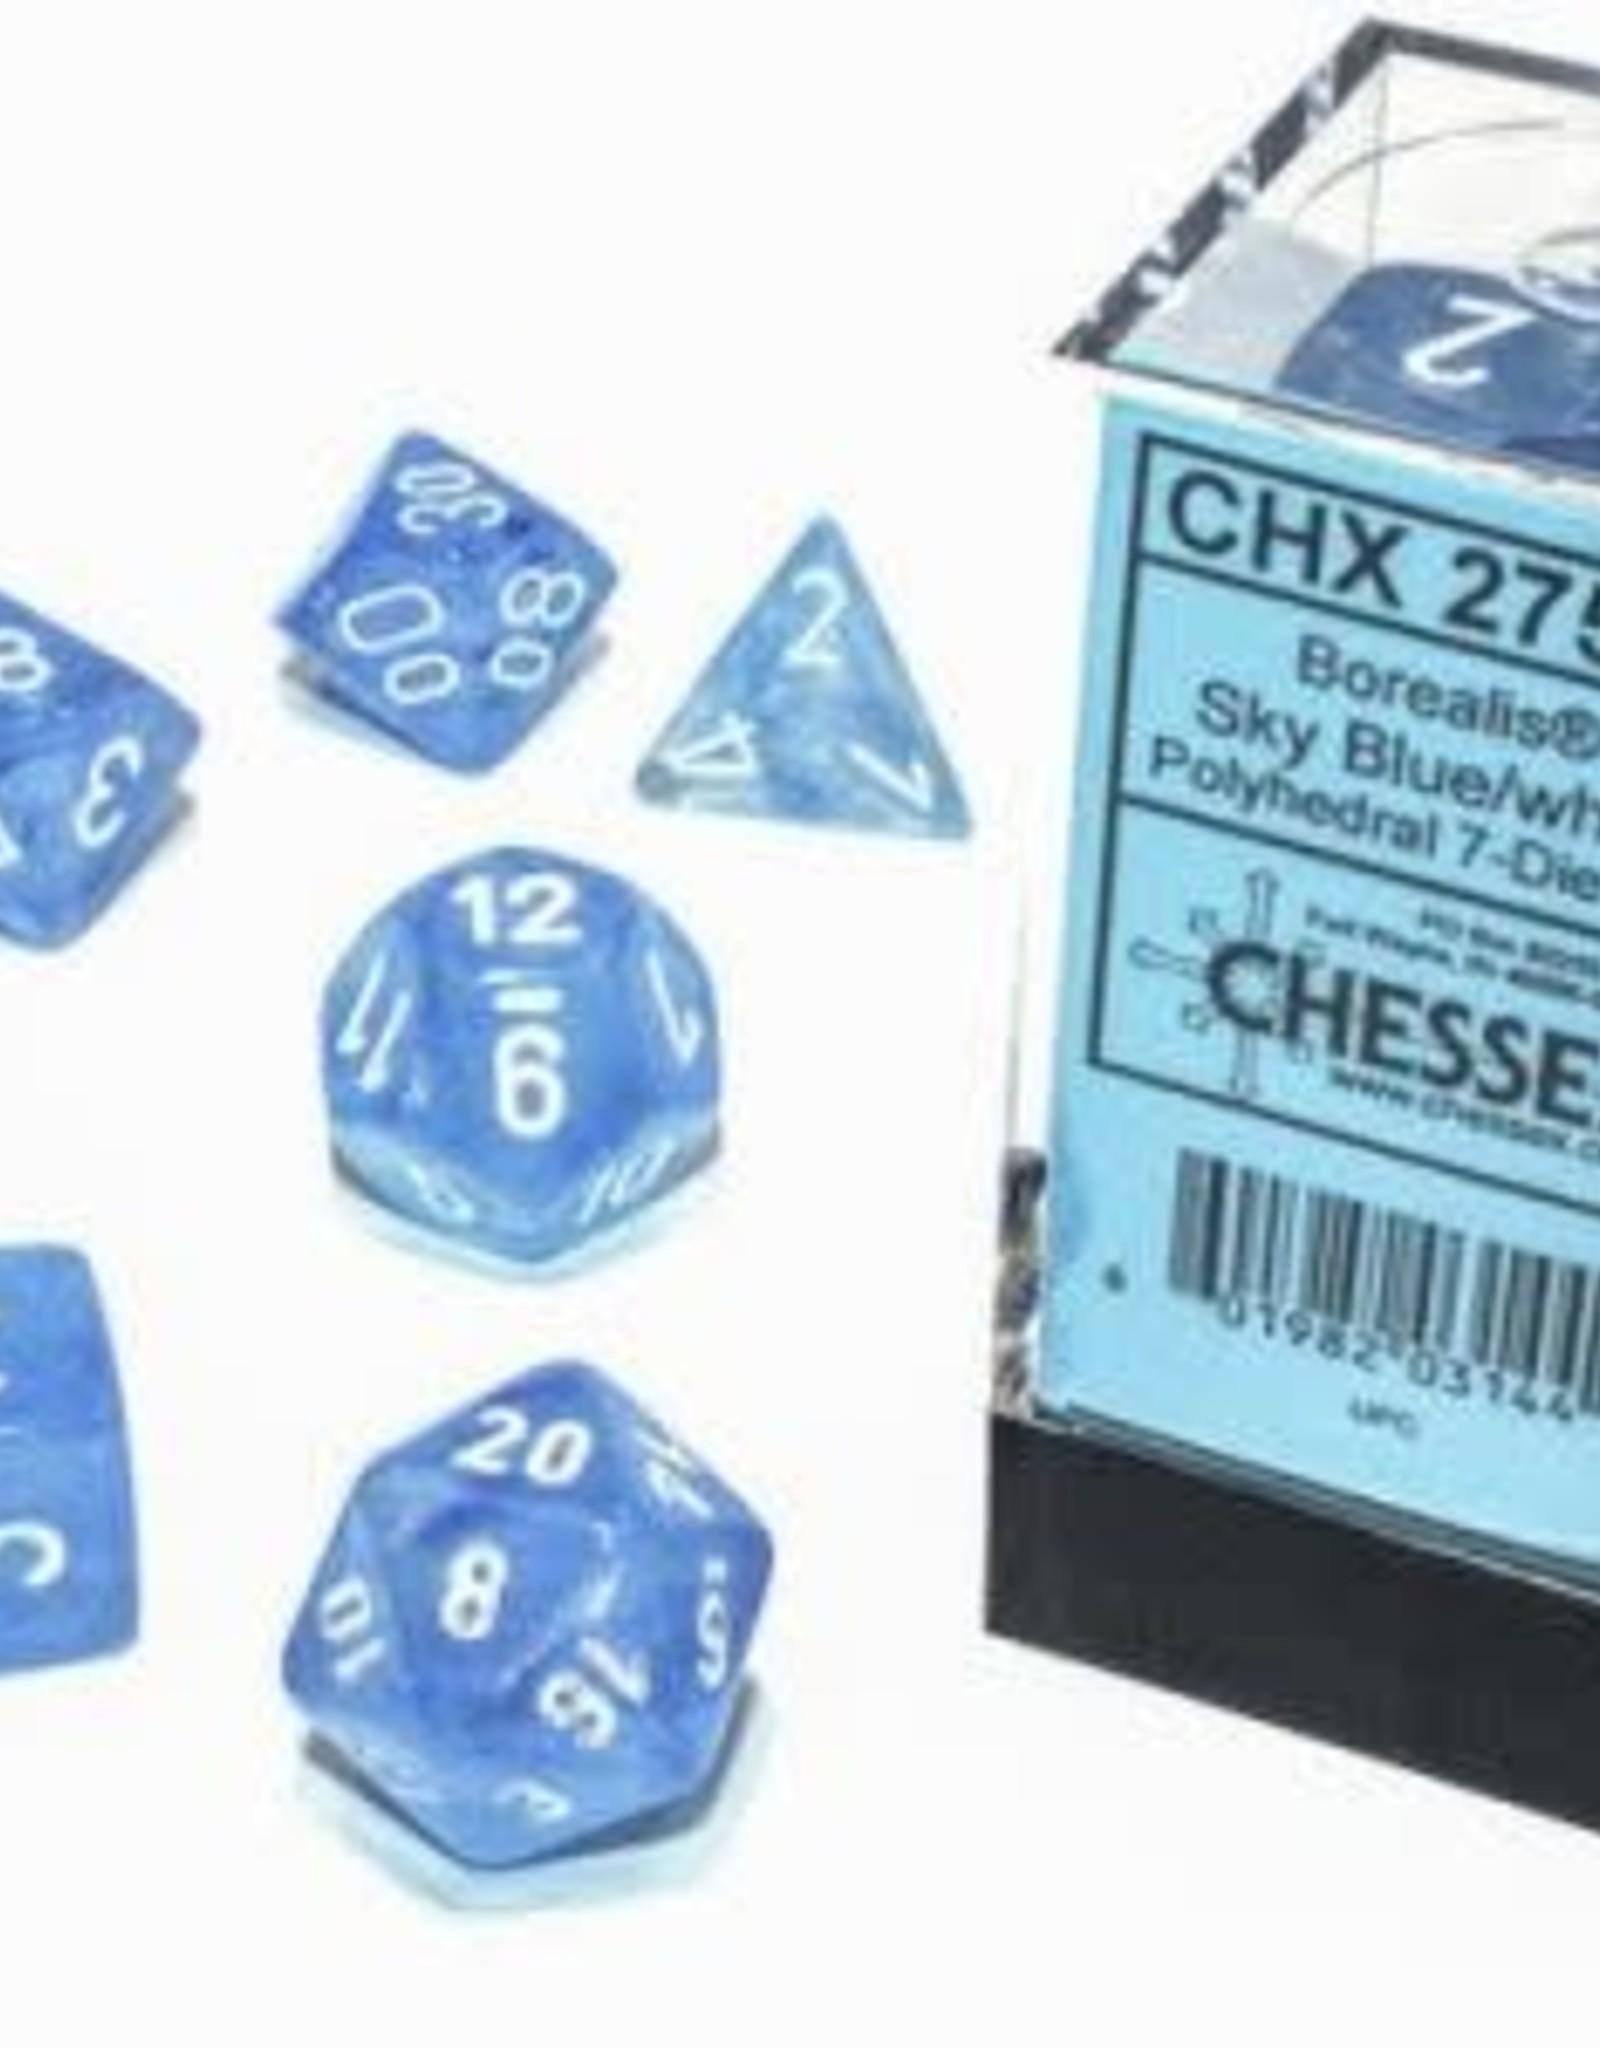 Chessex Dice Block 7ct. - Borealis Skyblue/White